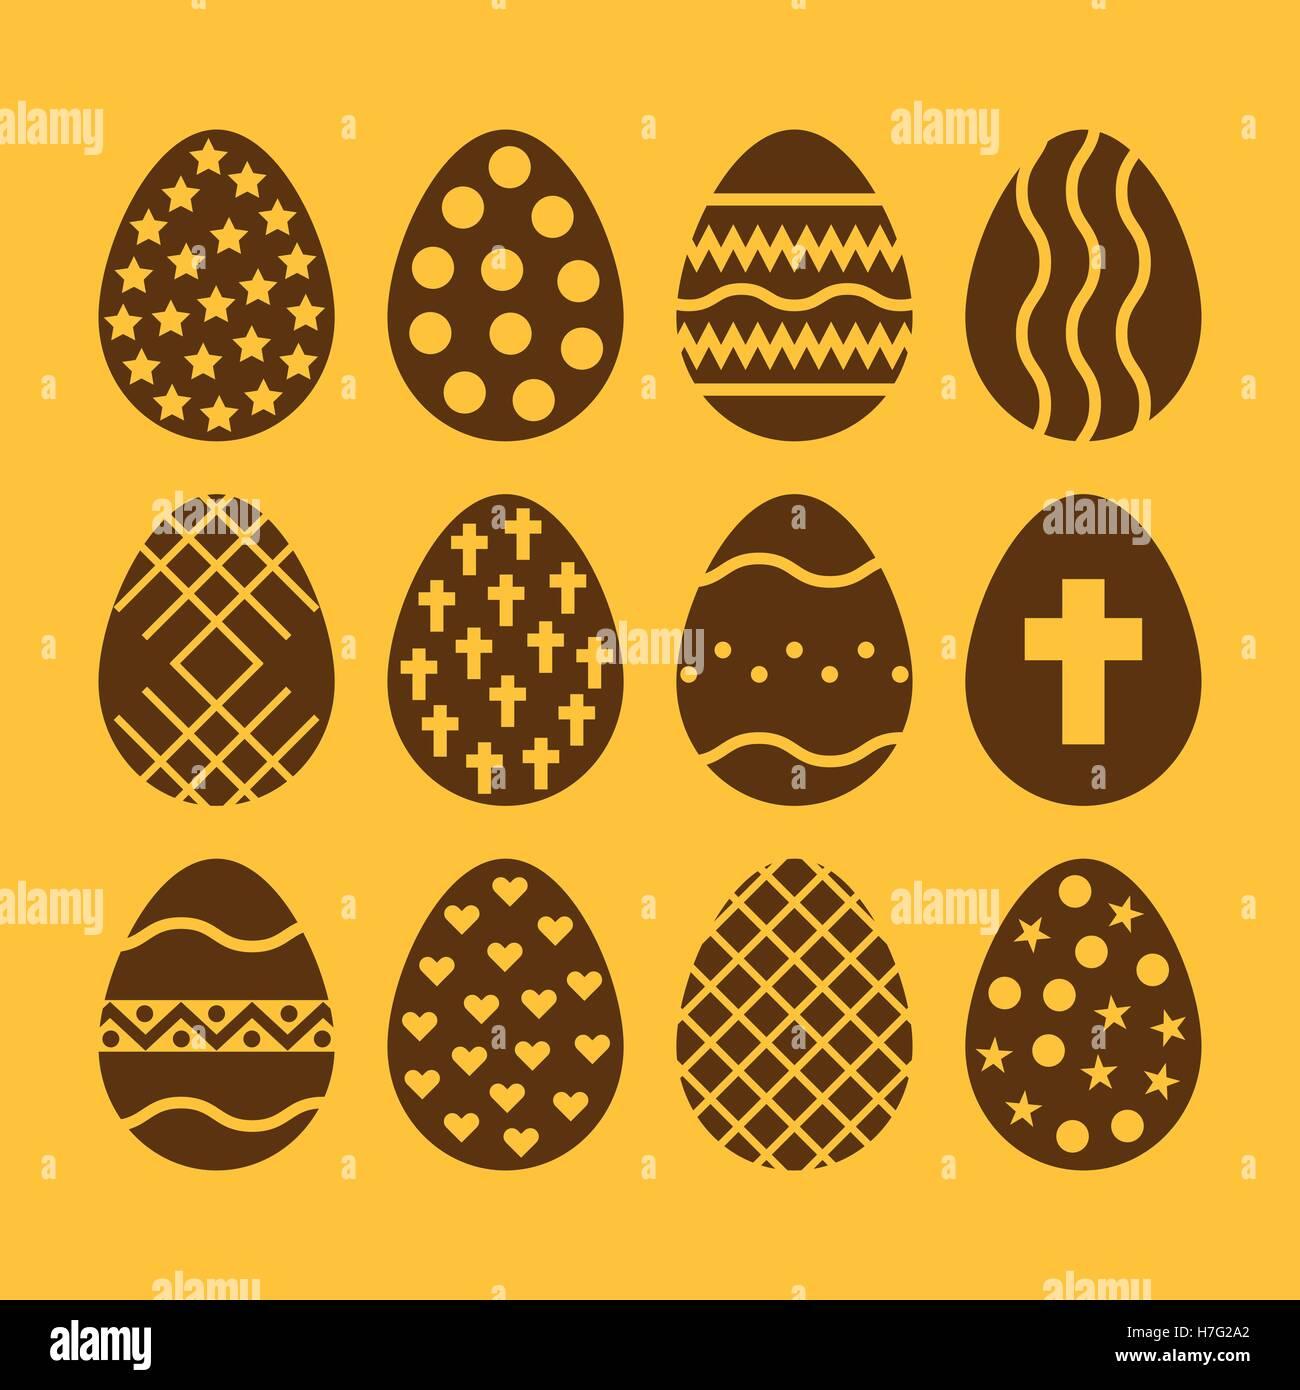 The egg and easter 12 icon easter egg symbol ui web logo the egg and easter 12 icon easter egg symbol ui web logo sign flat design app stock vector buycottarizona